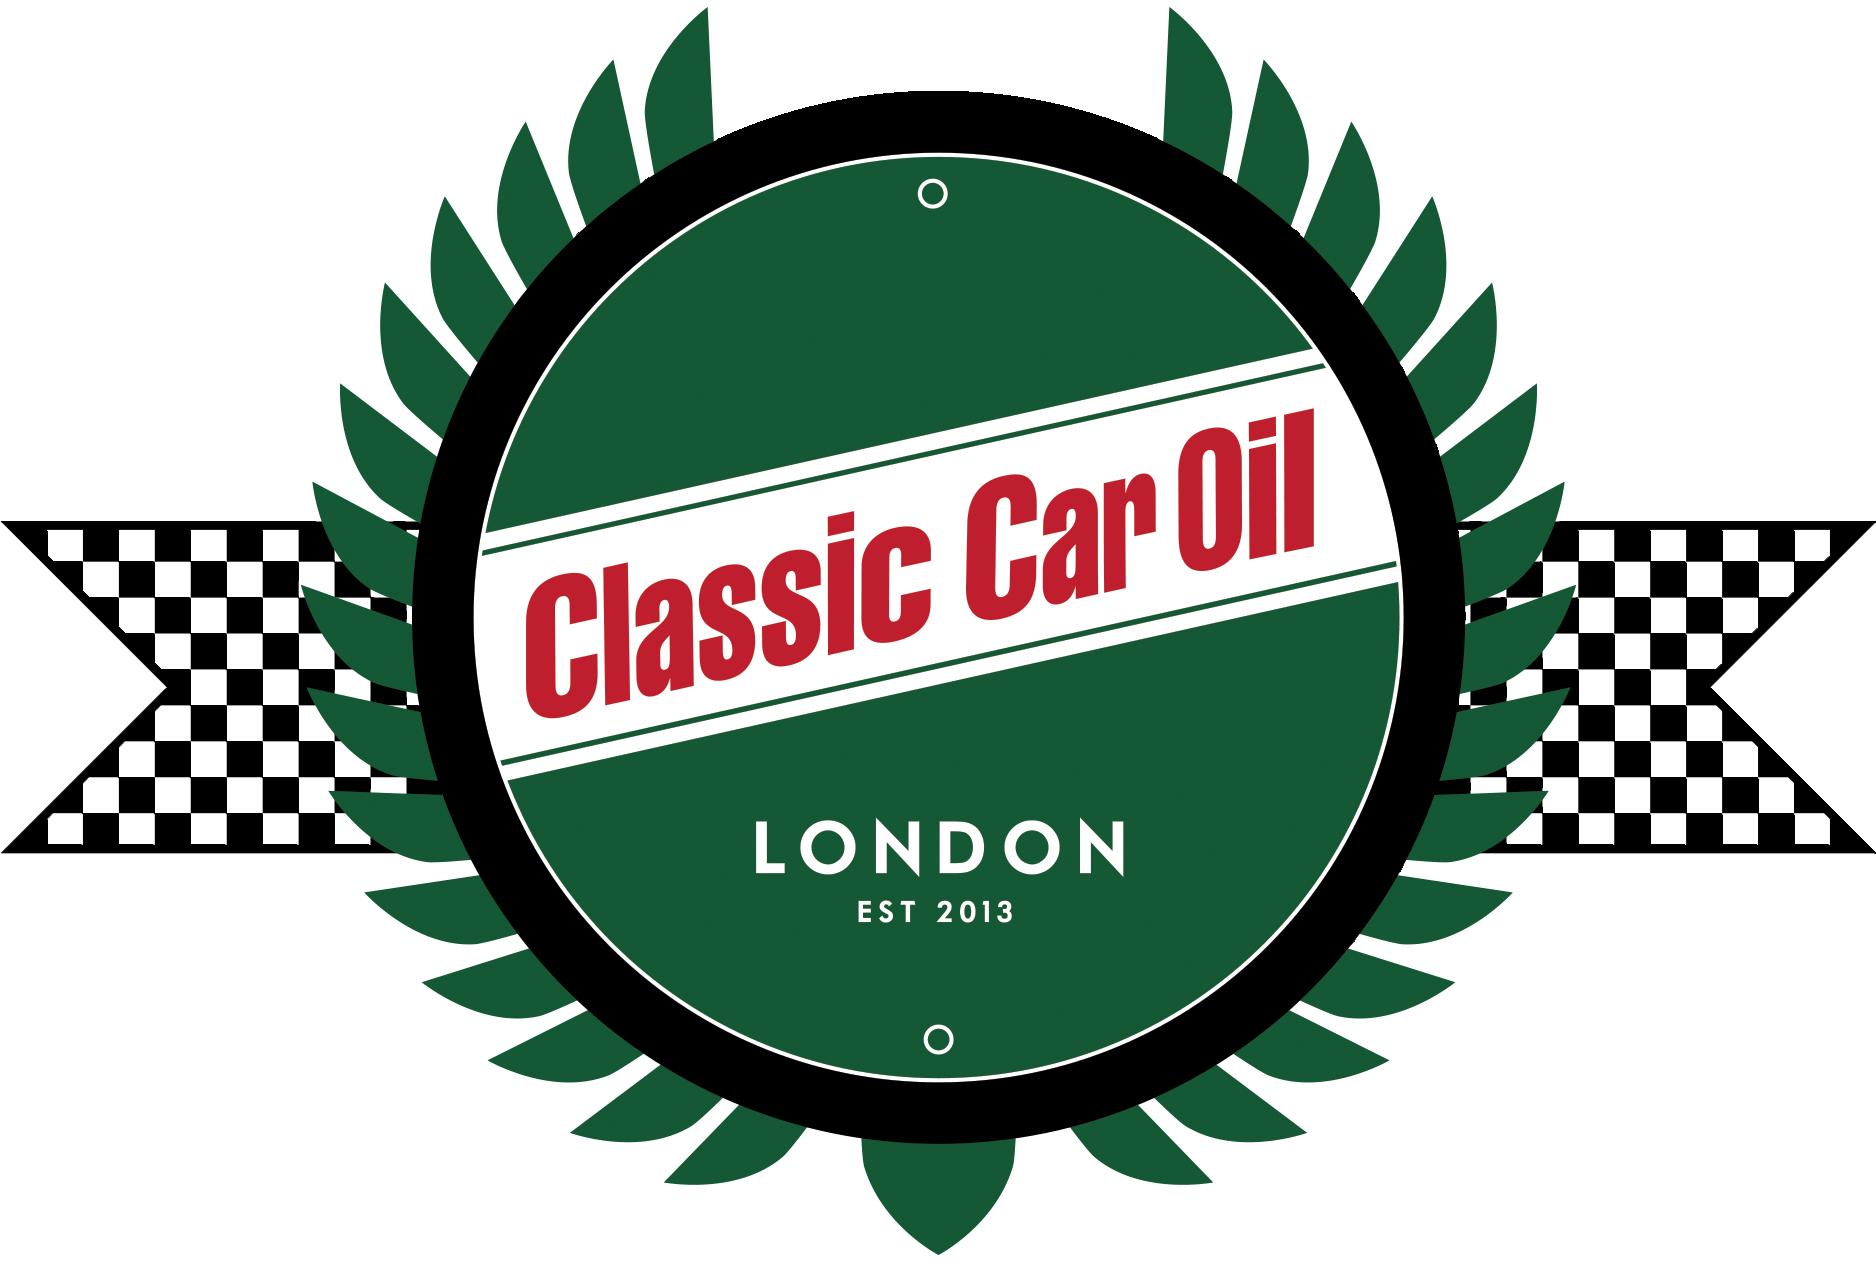 Classic Car Oil London